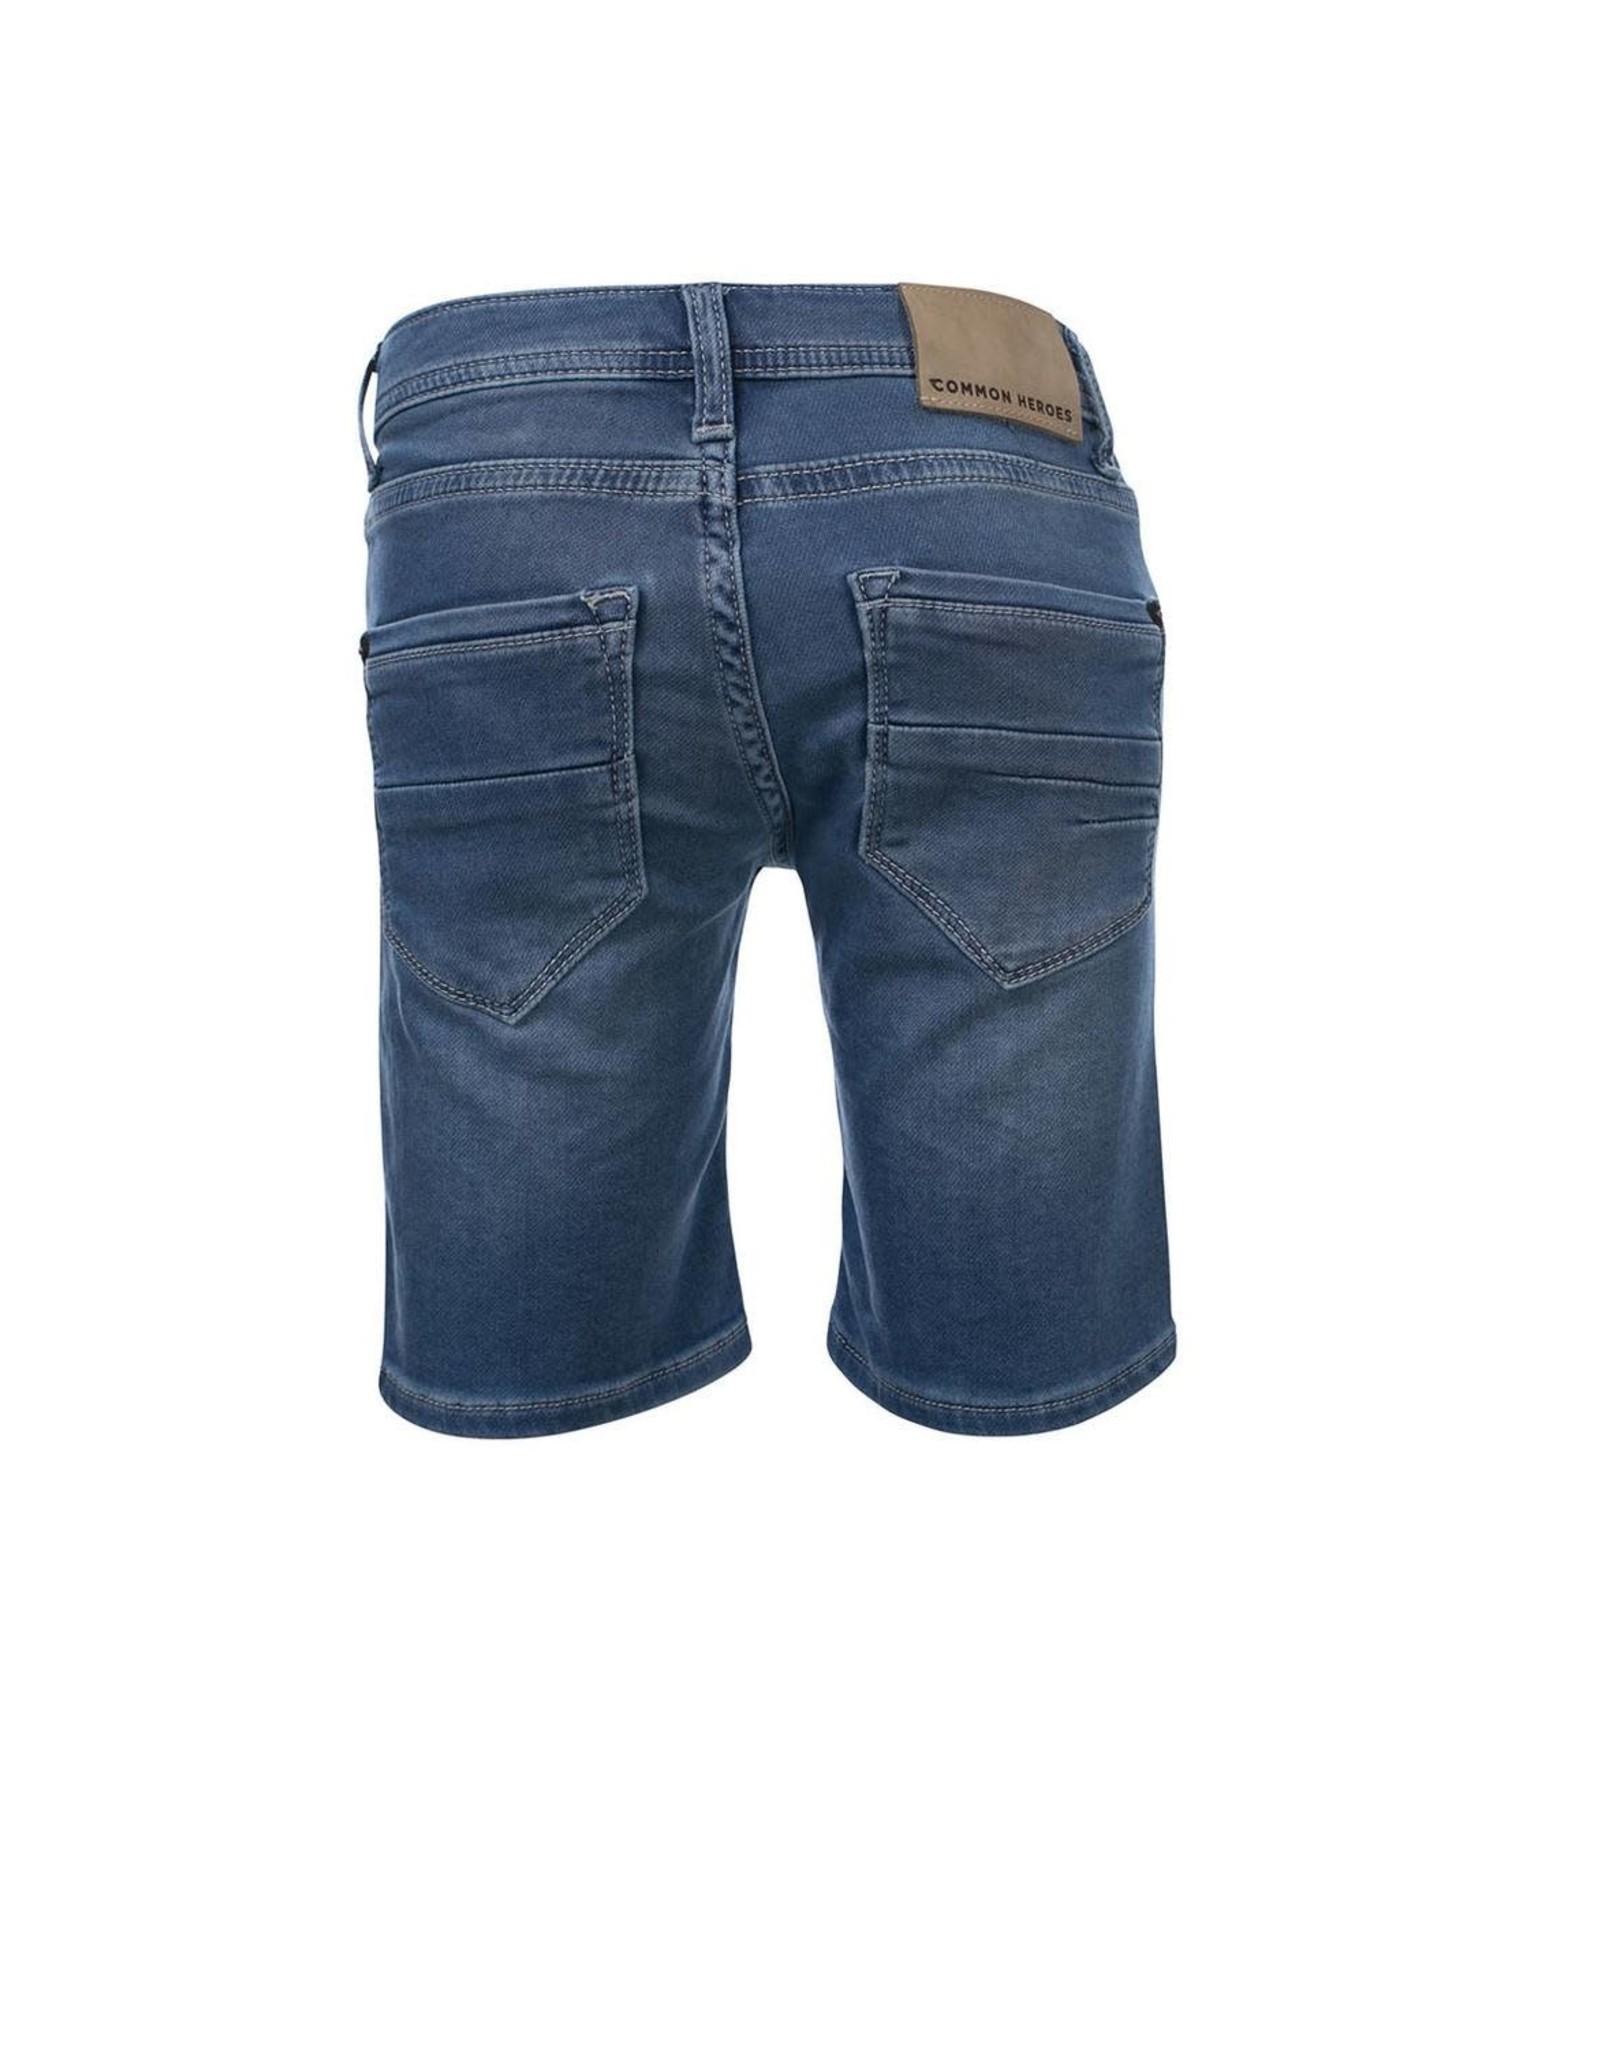 Common Heroes DEAN Jog denim shorts Light wash